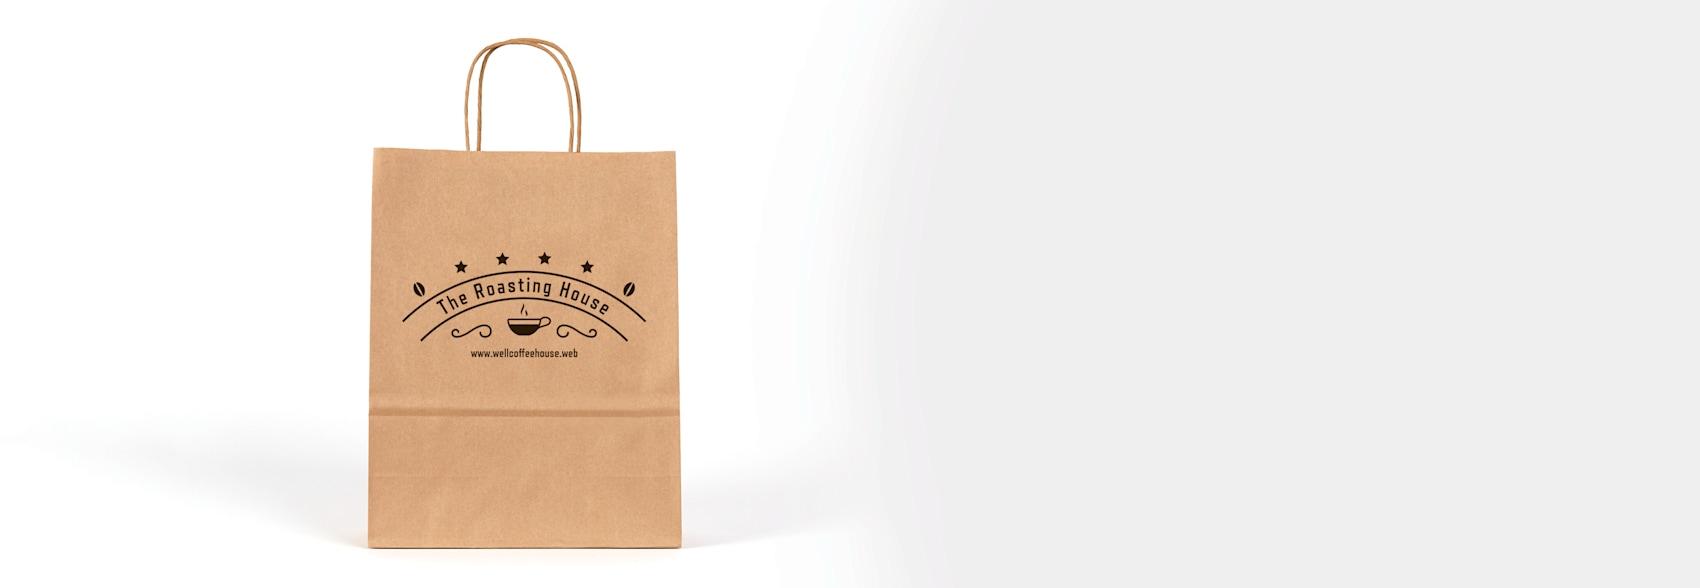 personalised kraft paper bag